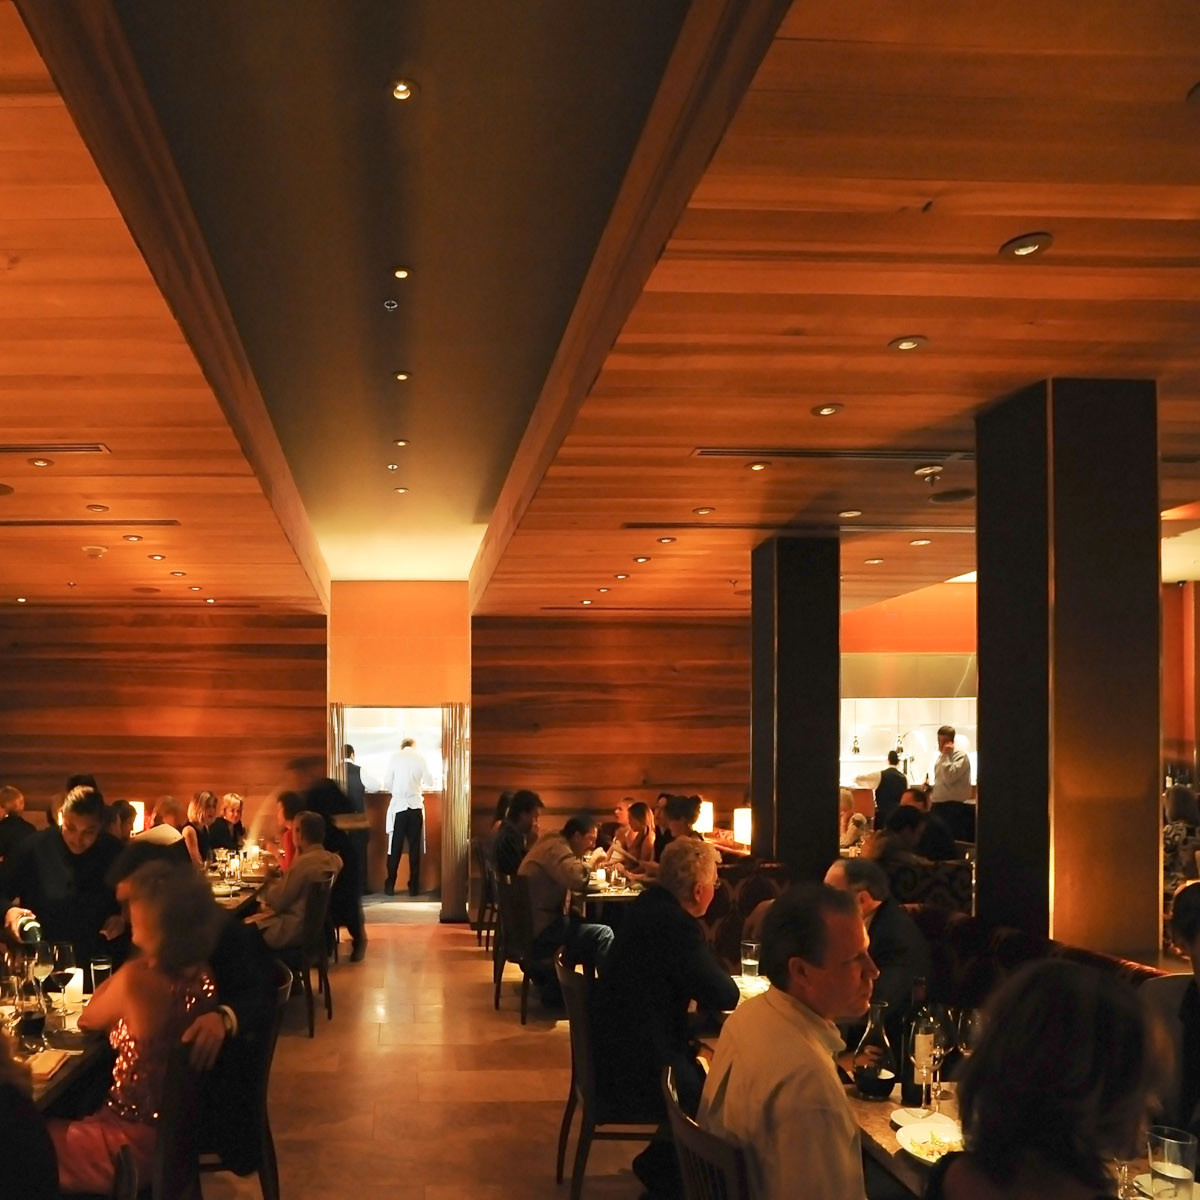 News_Sarah_Restaurant Roundup_Feb. 2010_RDG_interior